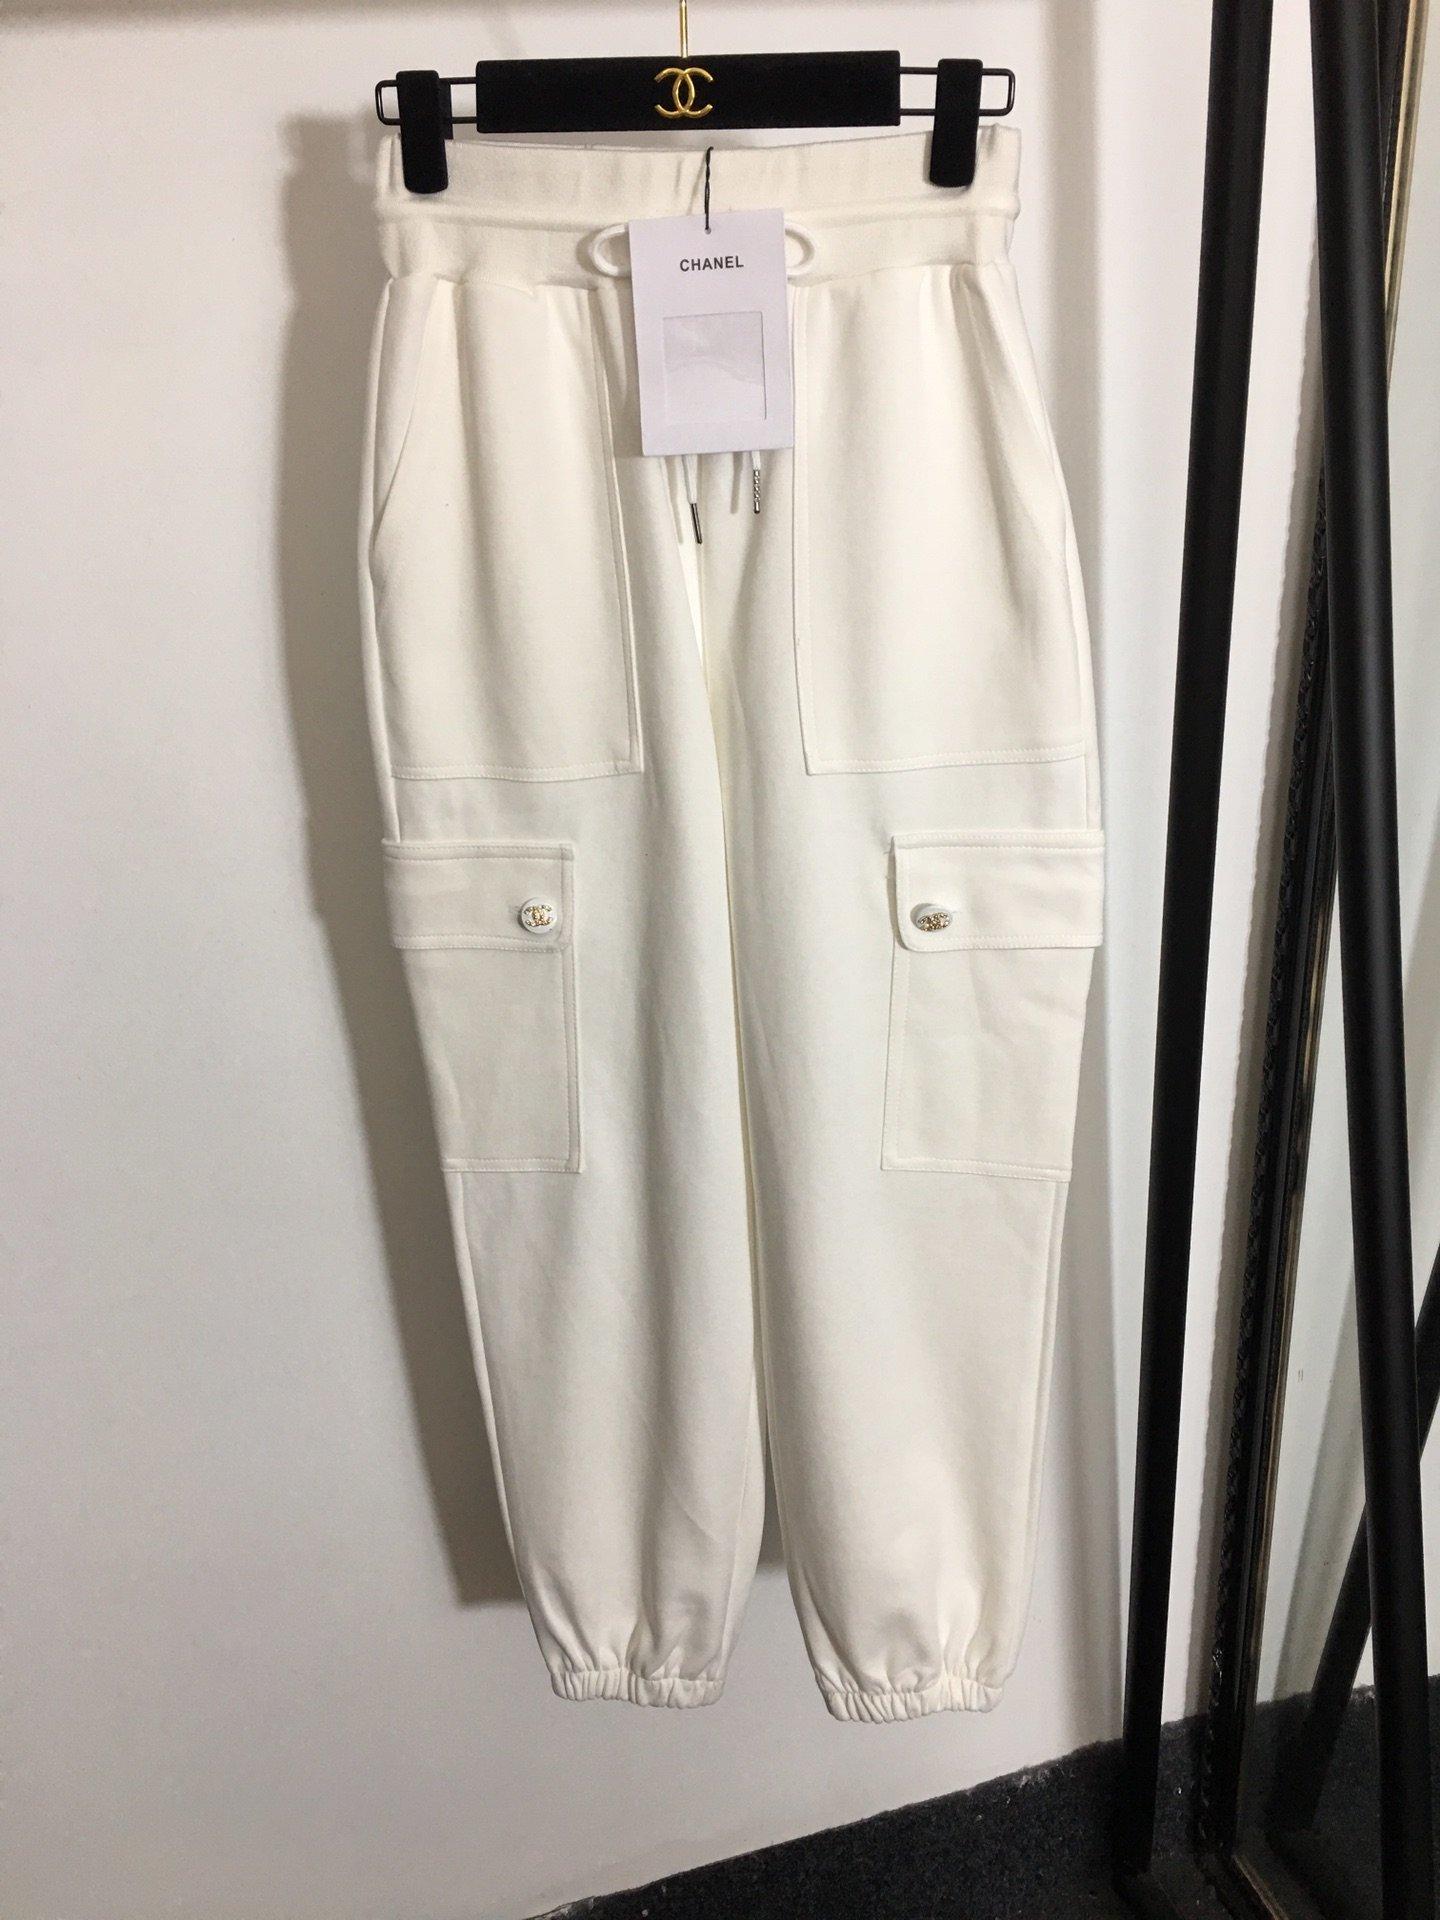 Chanel新款松紧高腰工装休闲卫裤